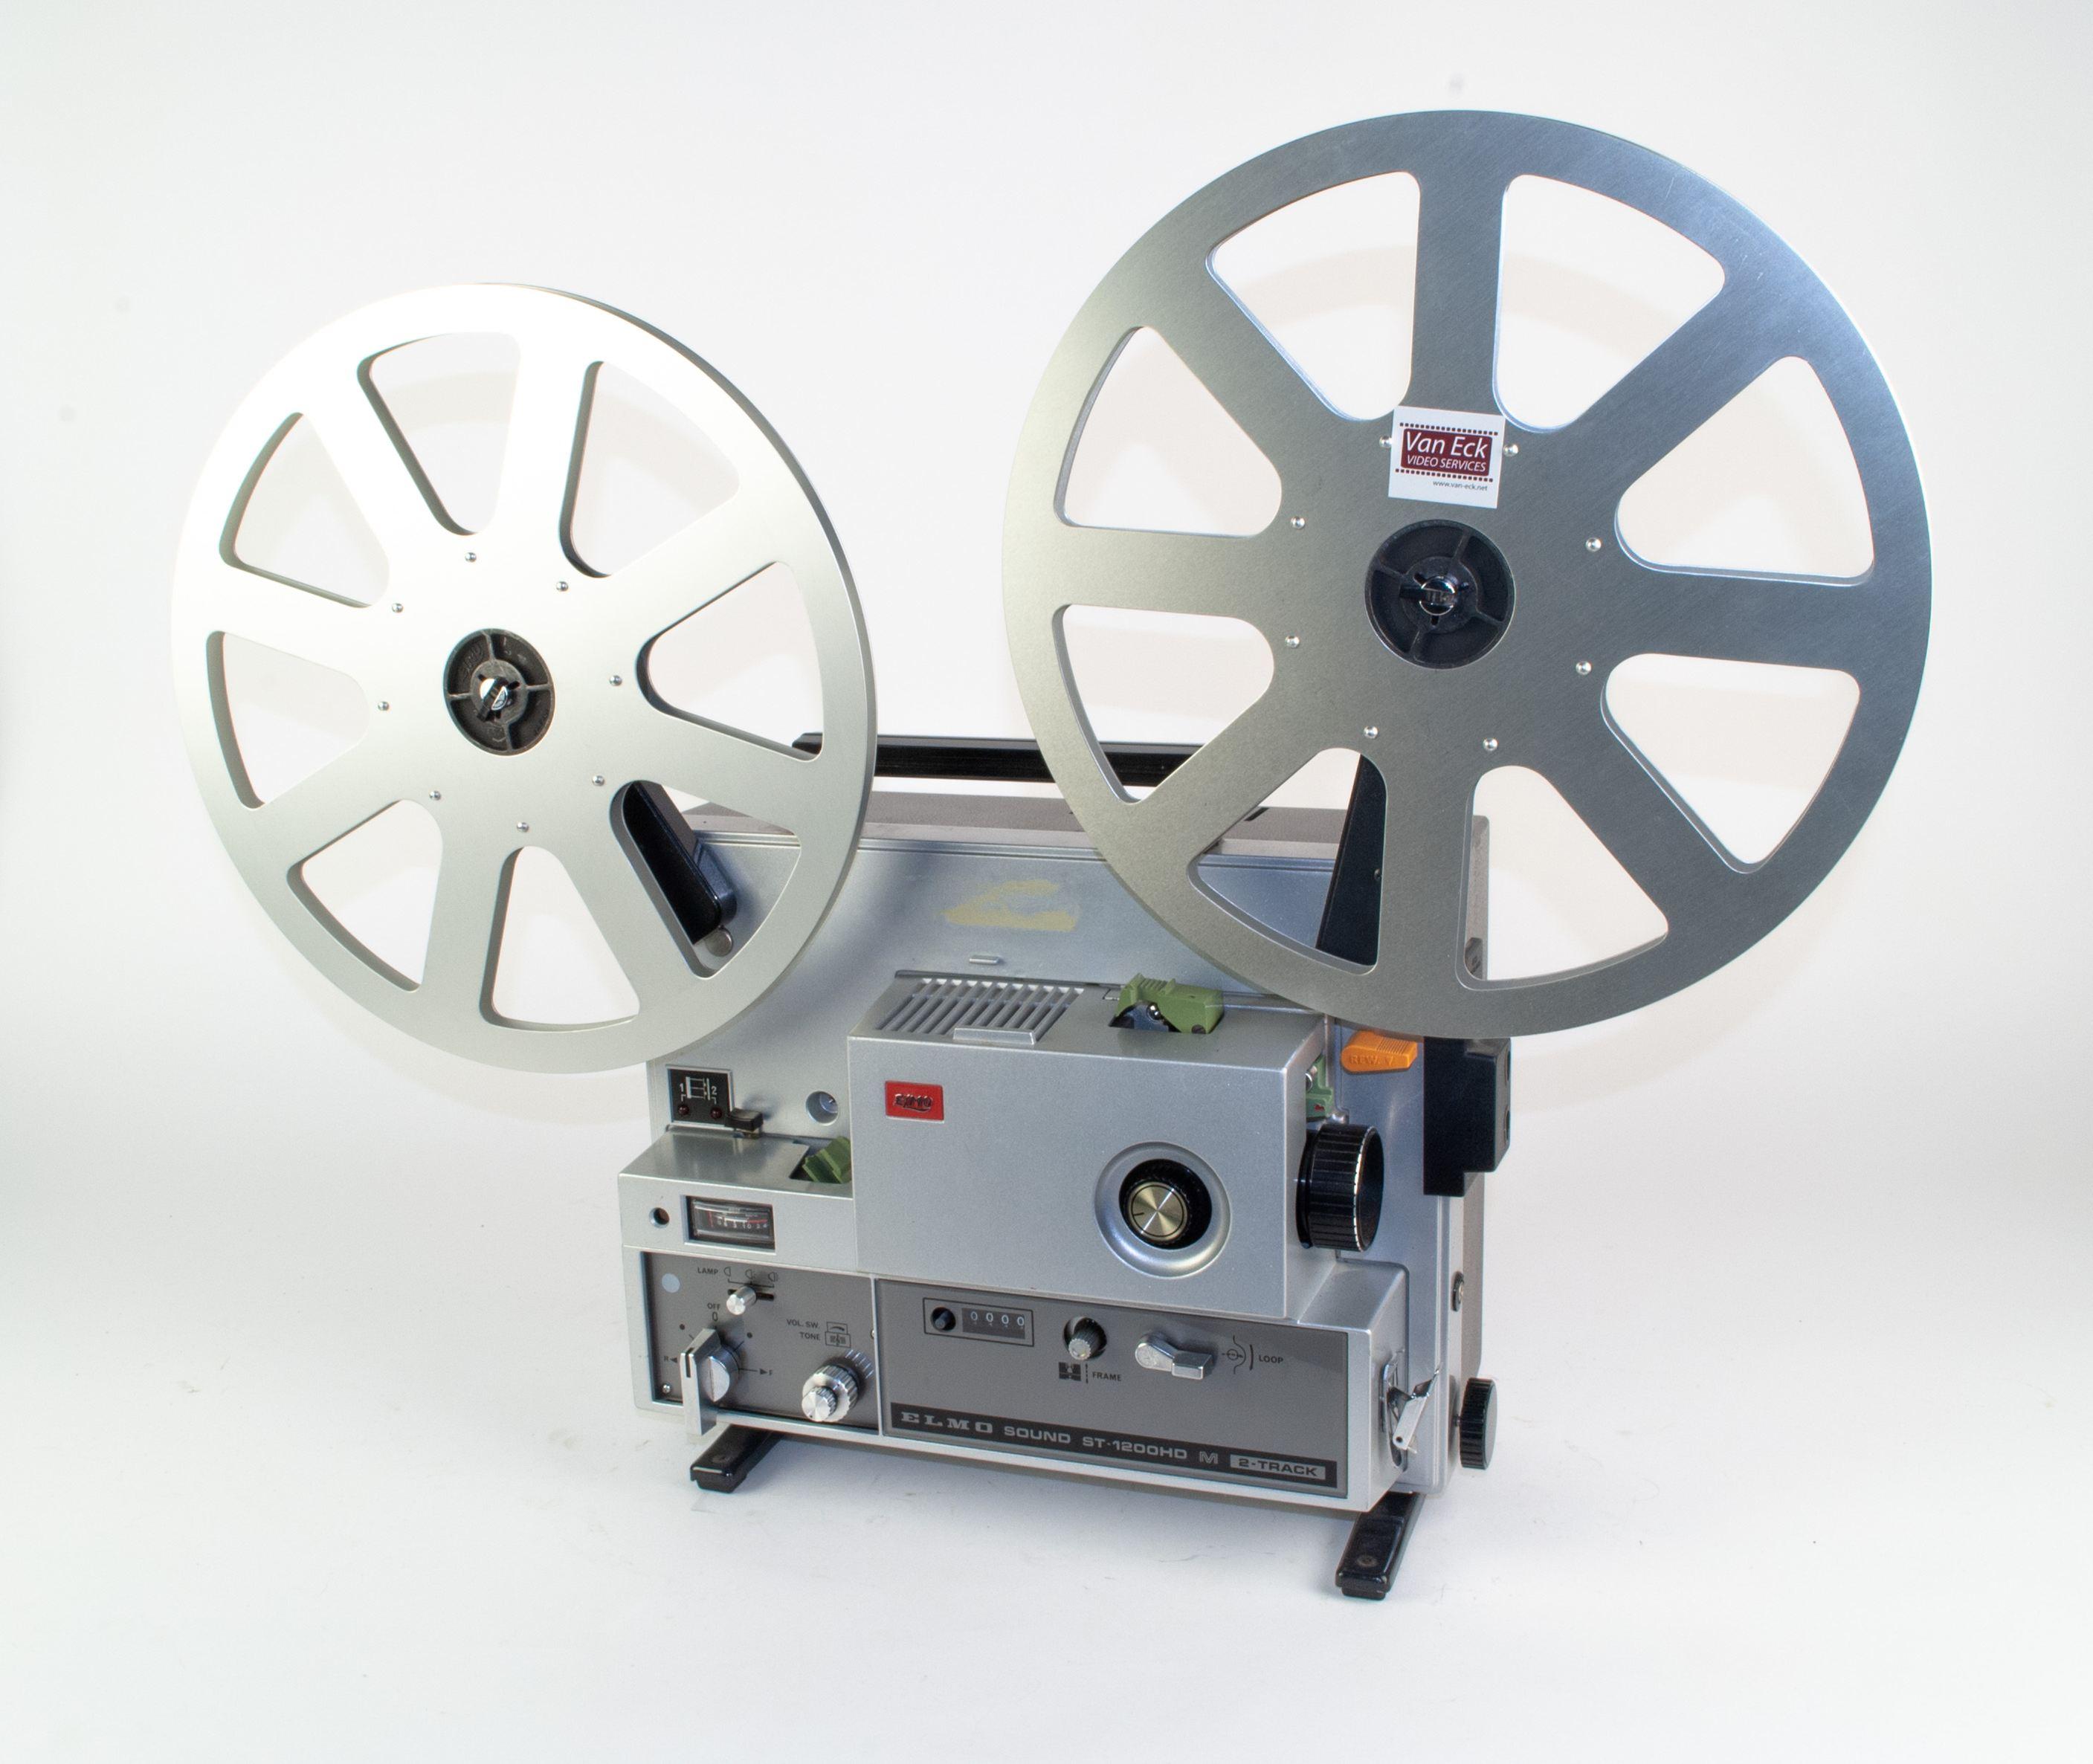 Sound ST-1200HD M 2 Track